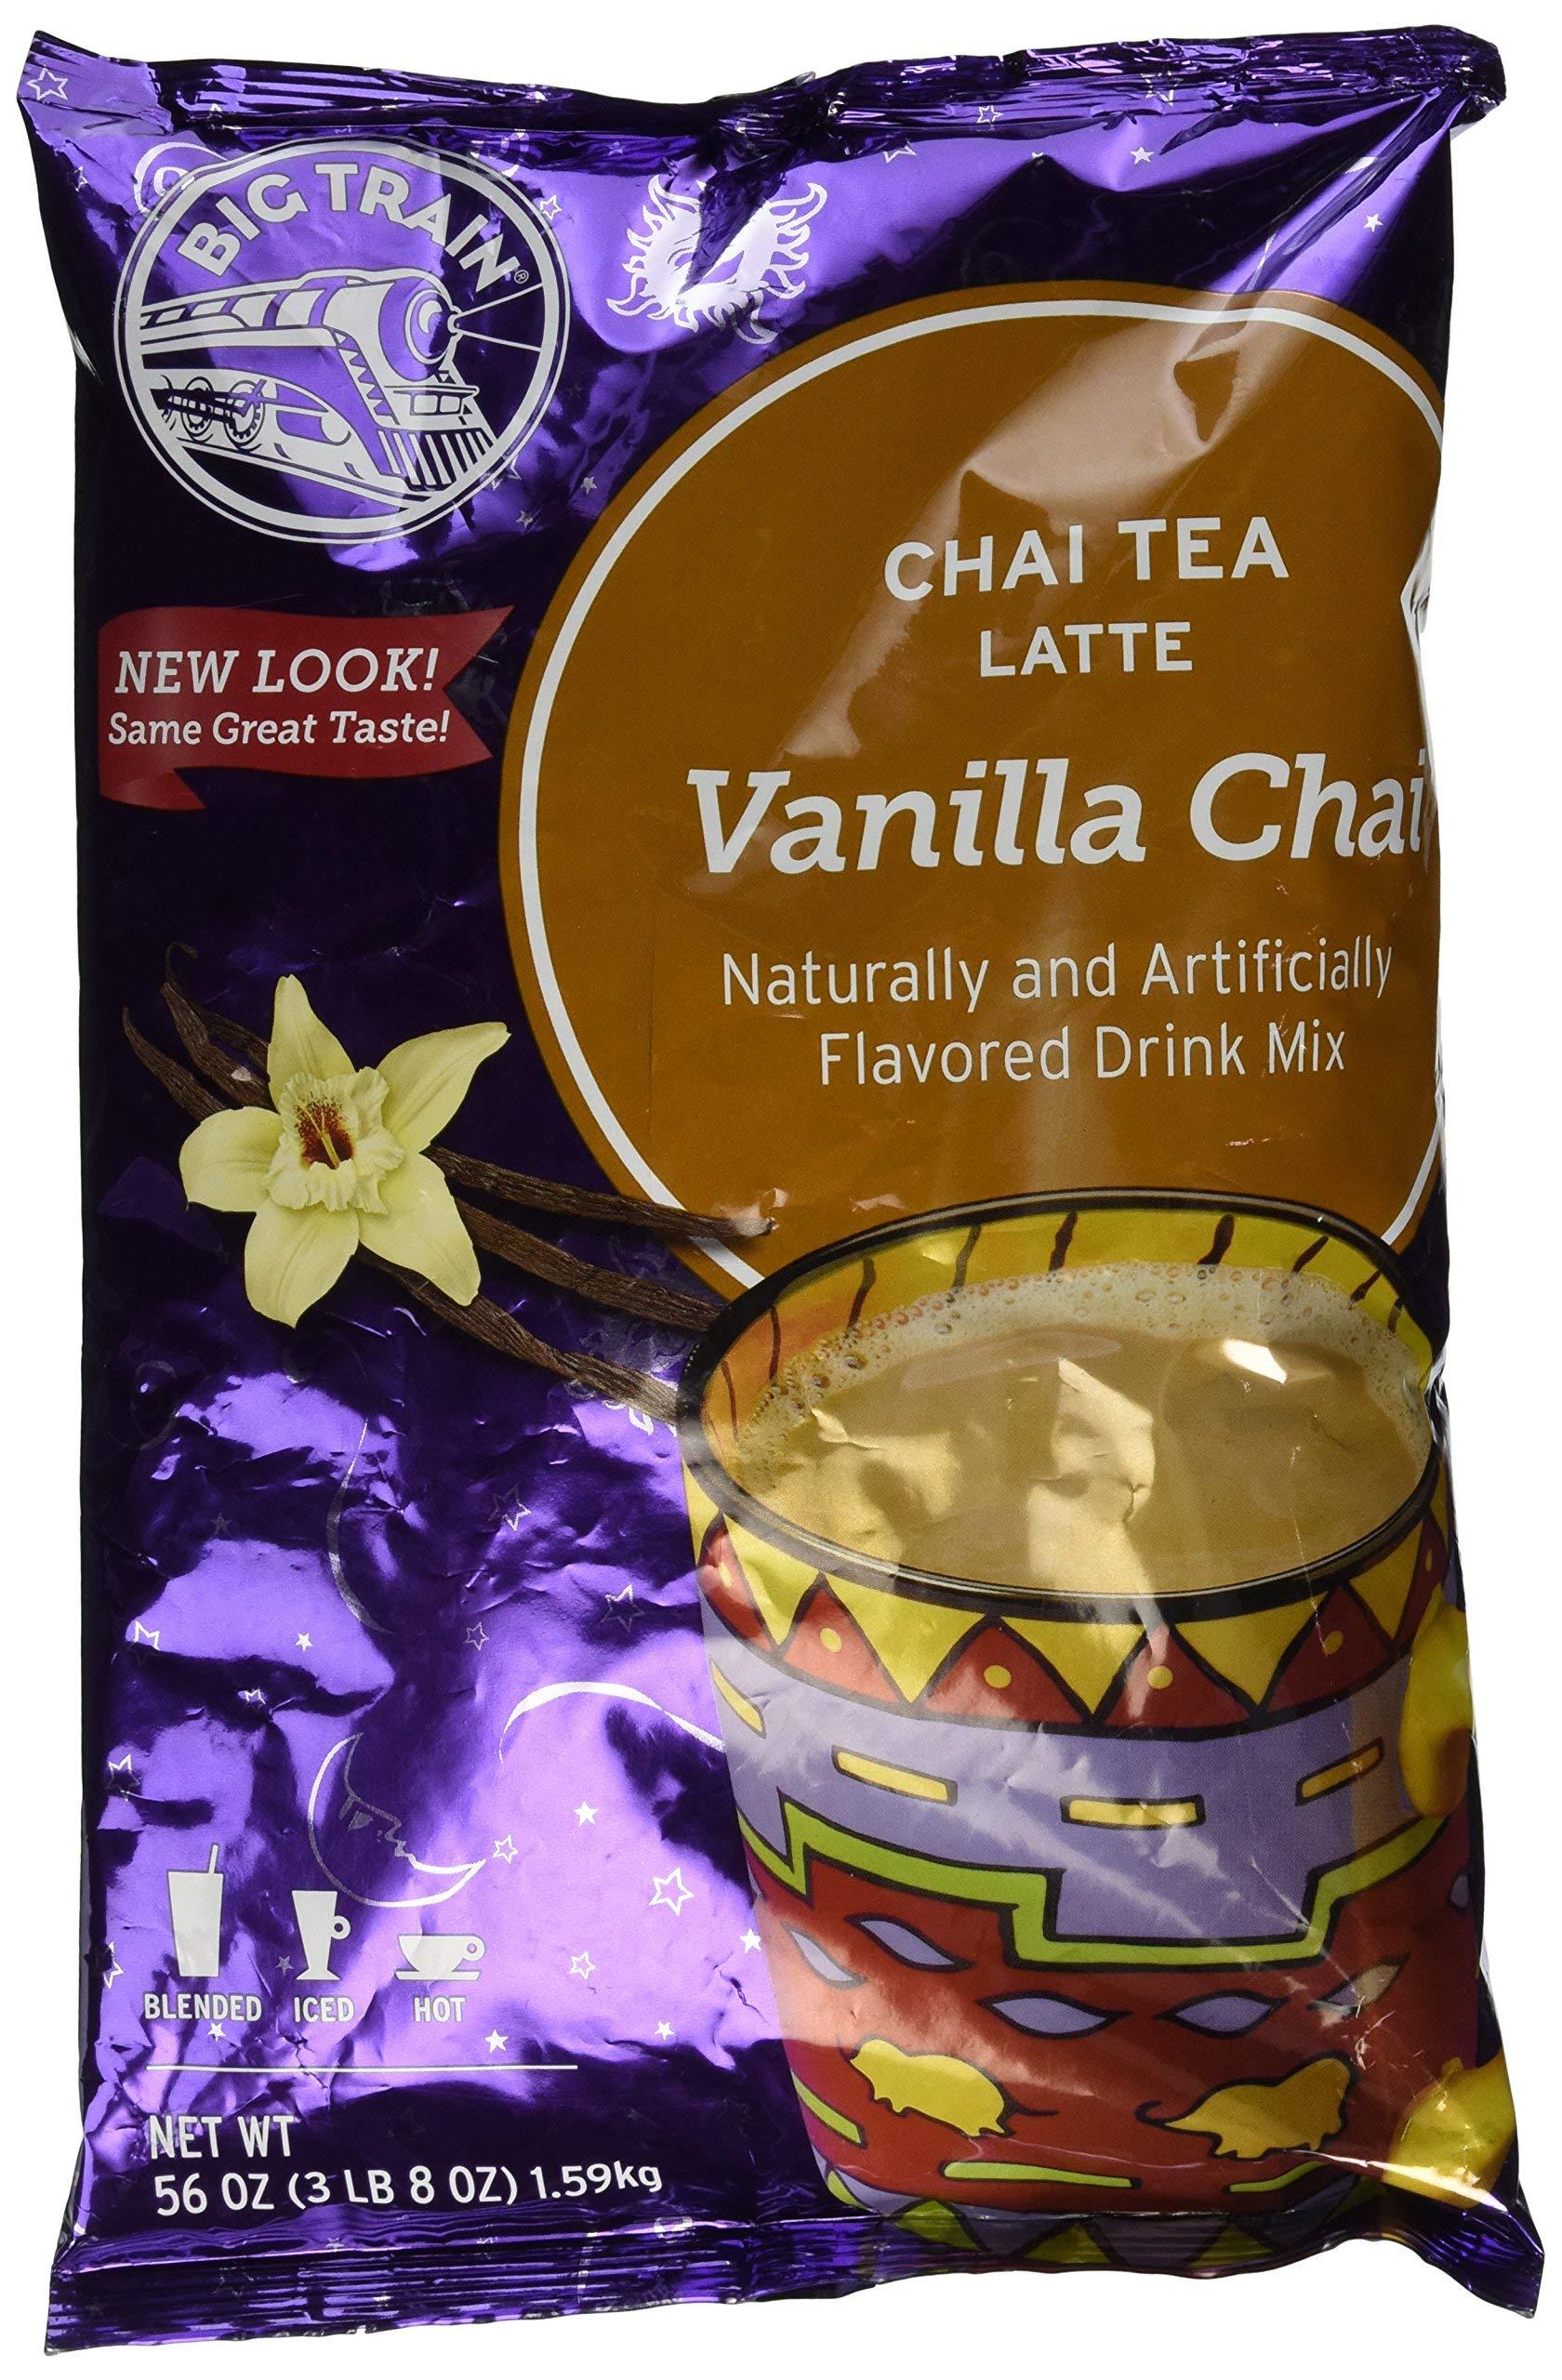 Big Train Chai - Vanilla Chai (3lb 8oz Bulk Bag) by Big Train